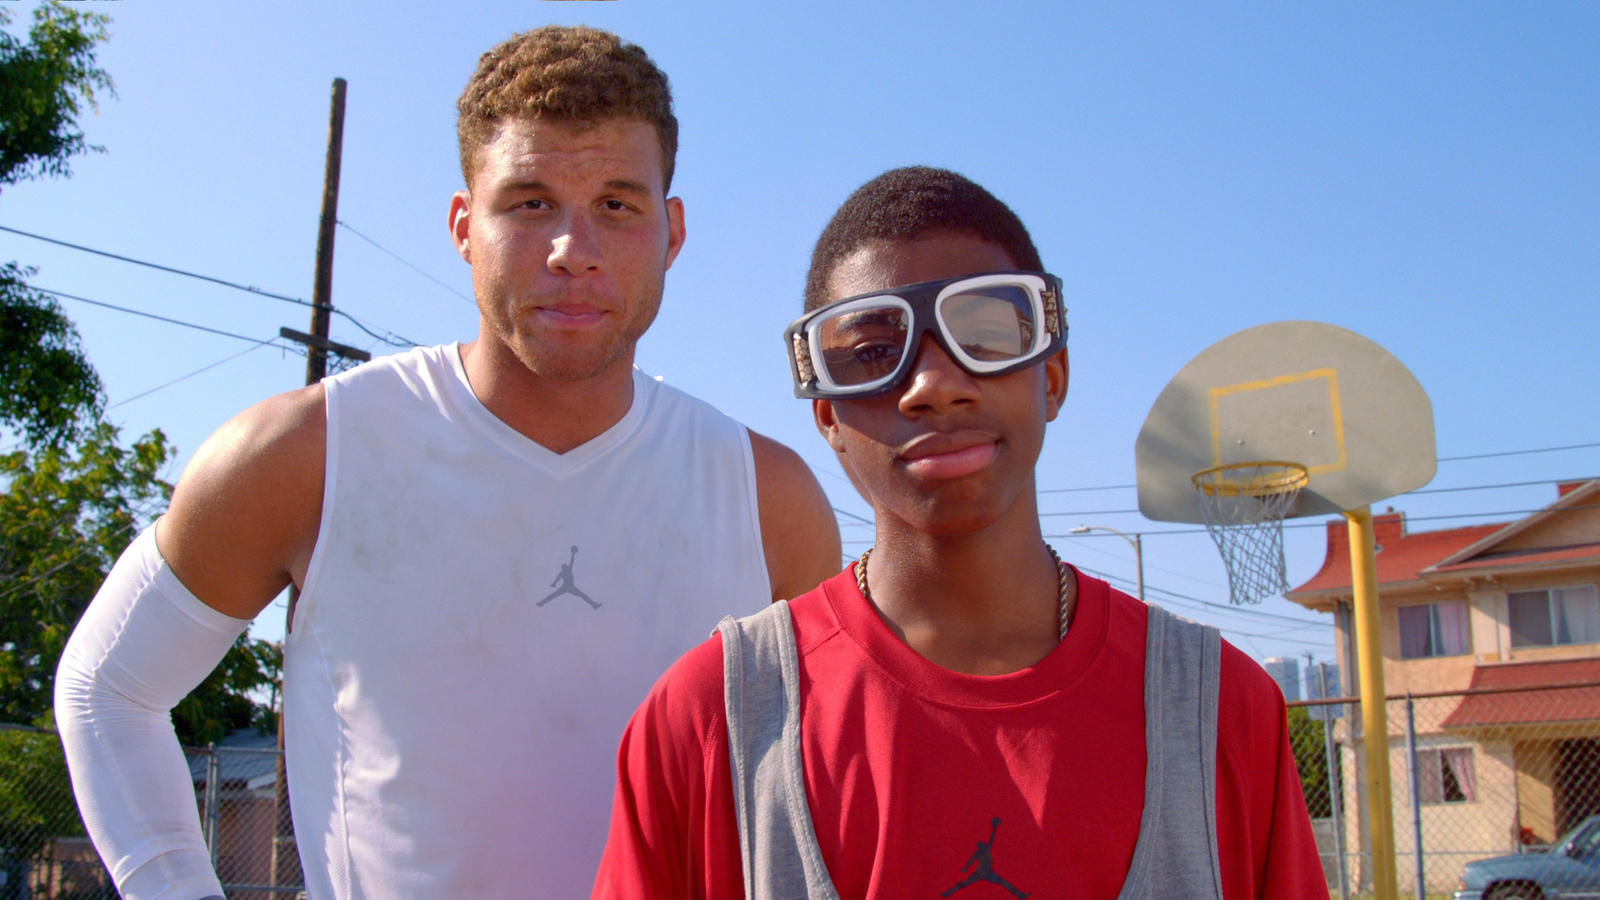 Blake and Drain